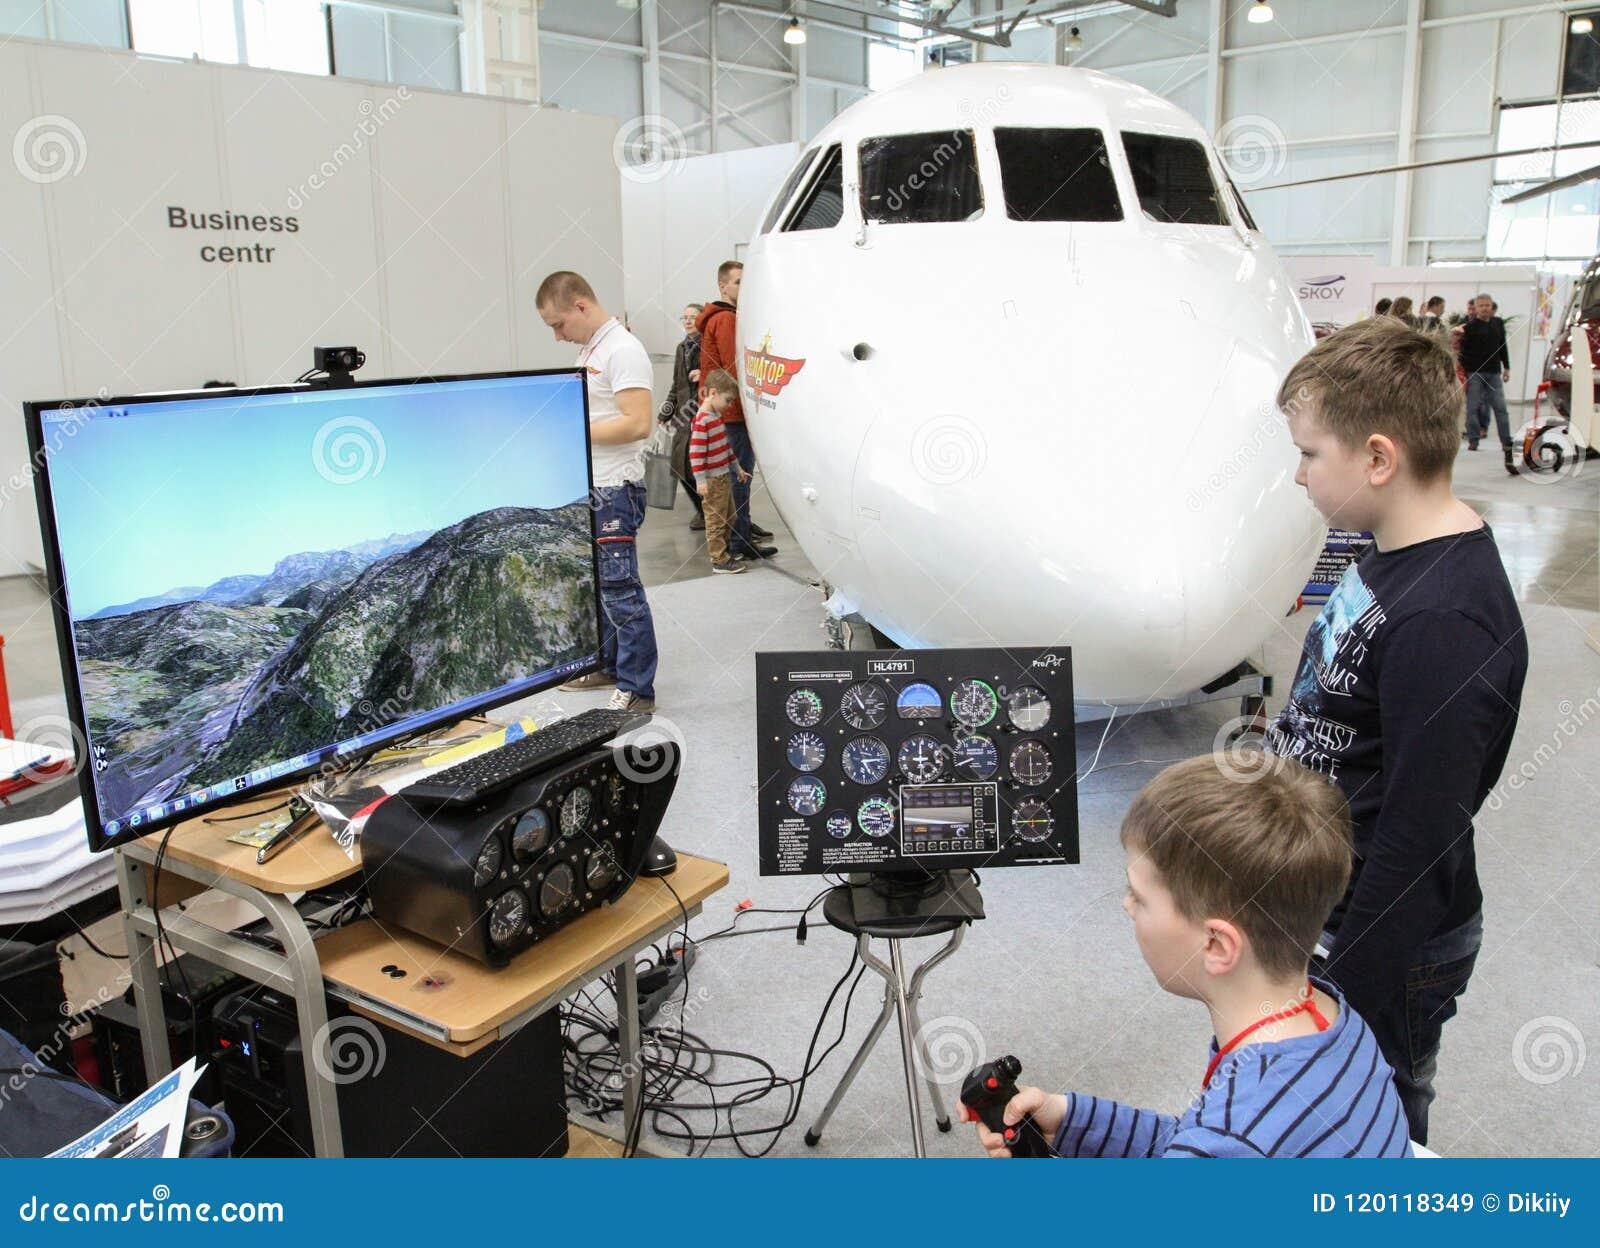 Training On The Flight Simulator Editorial Stock Image - Image of